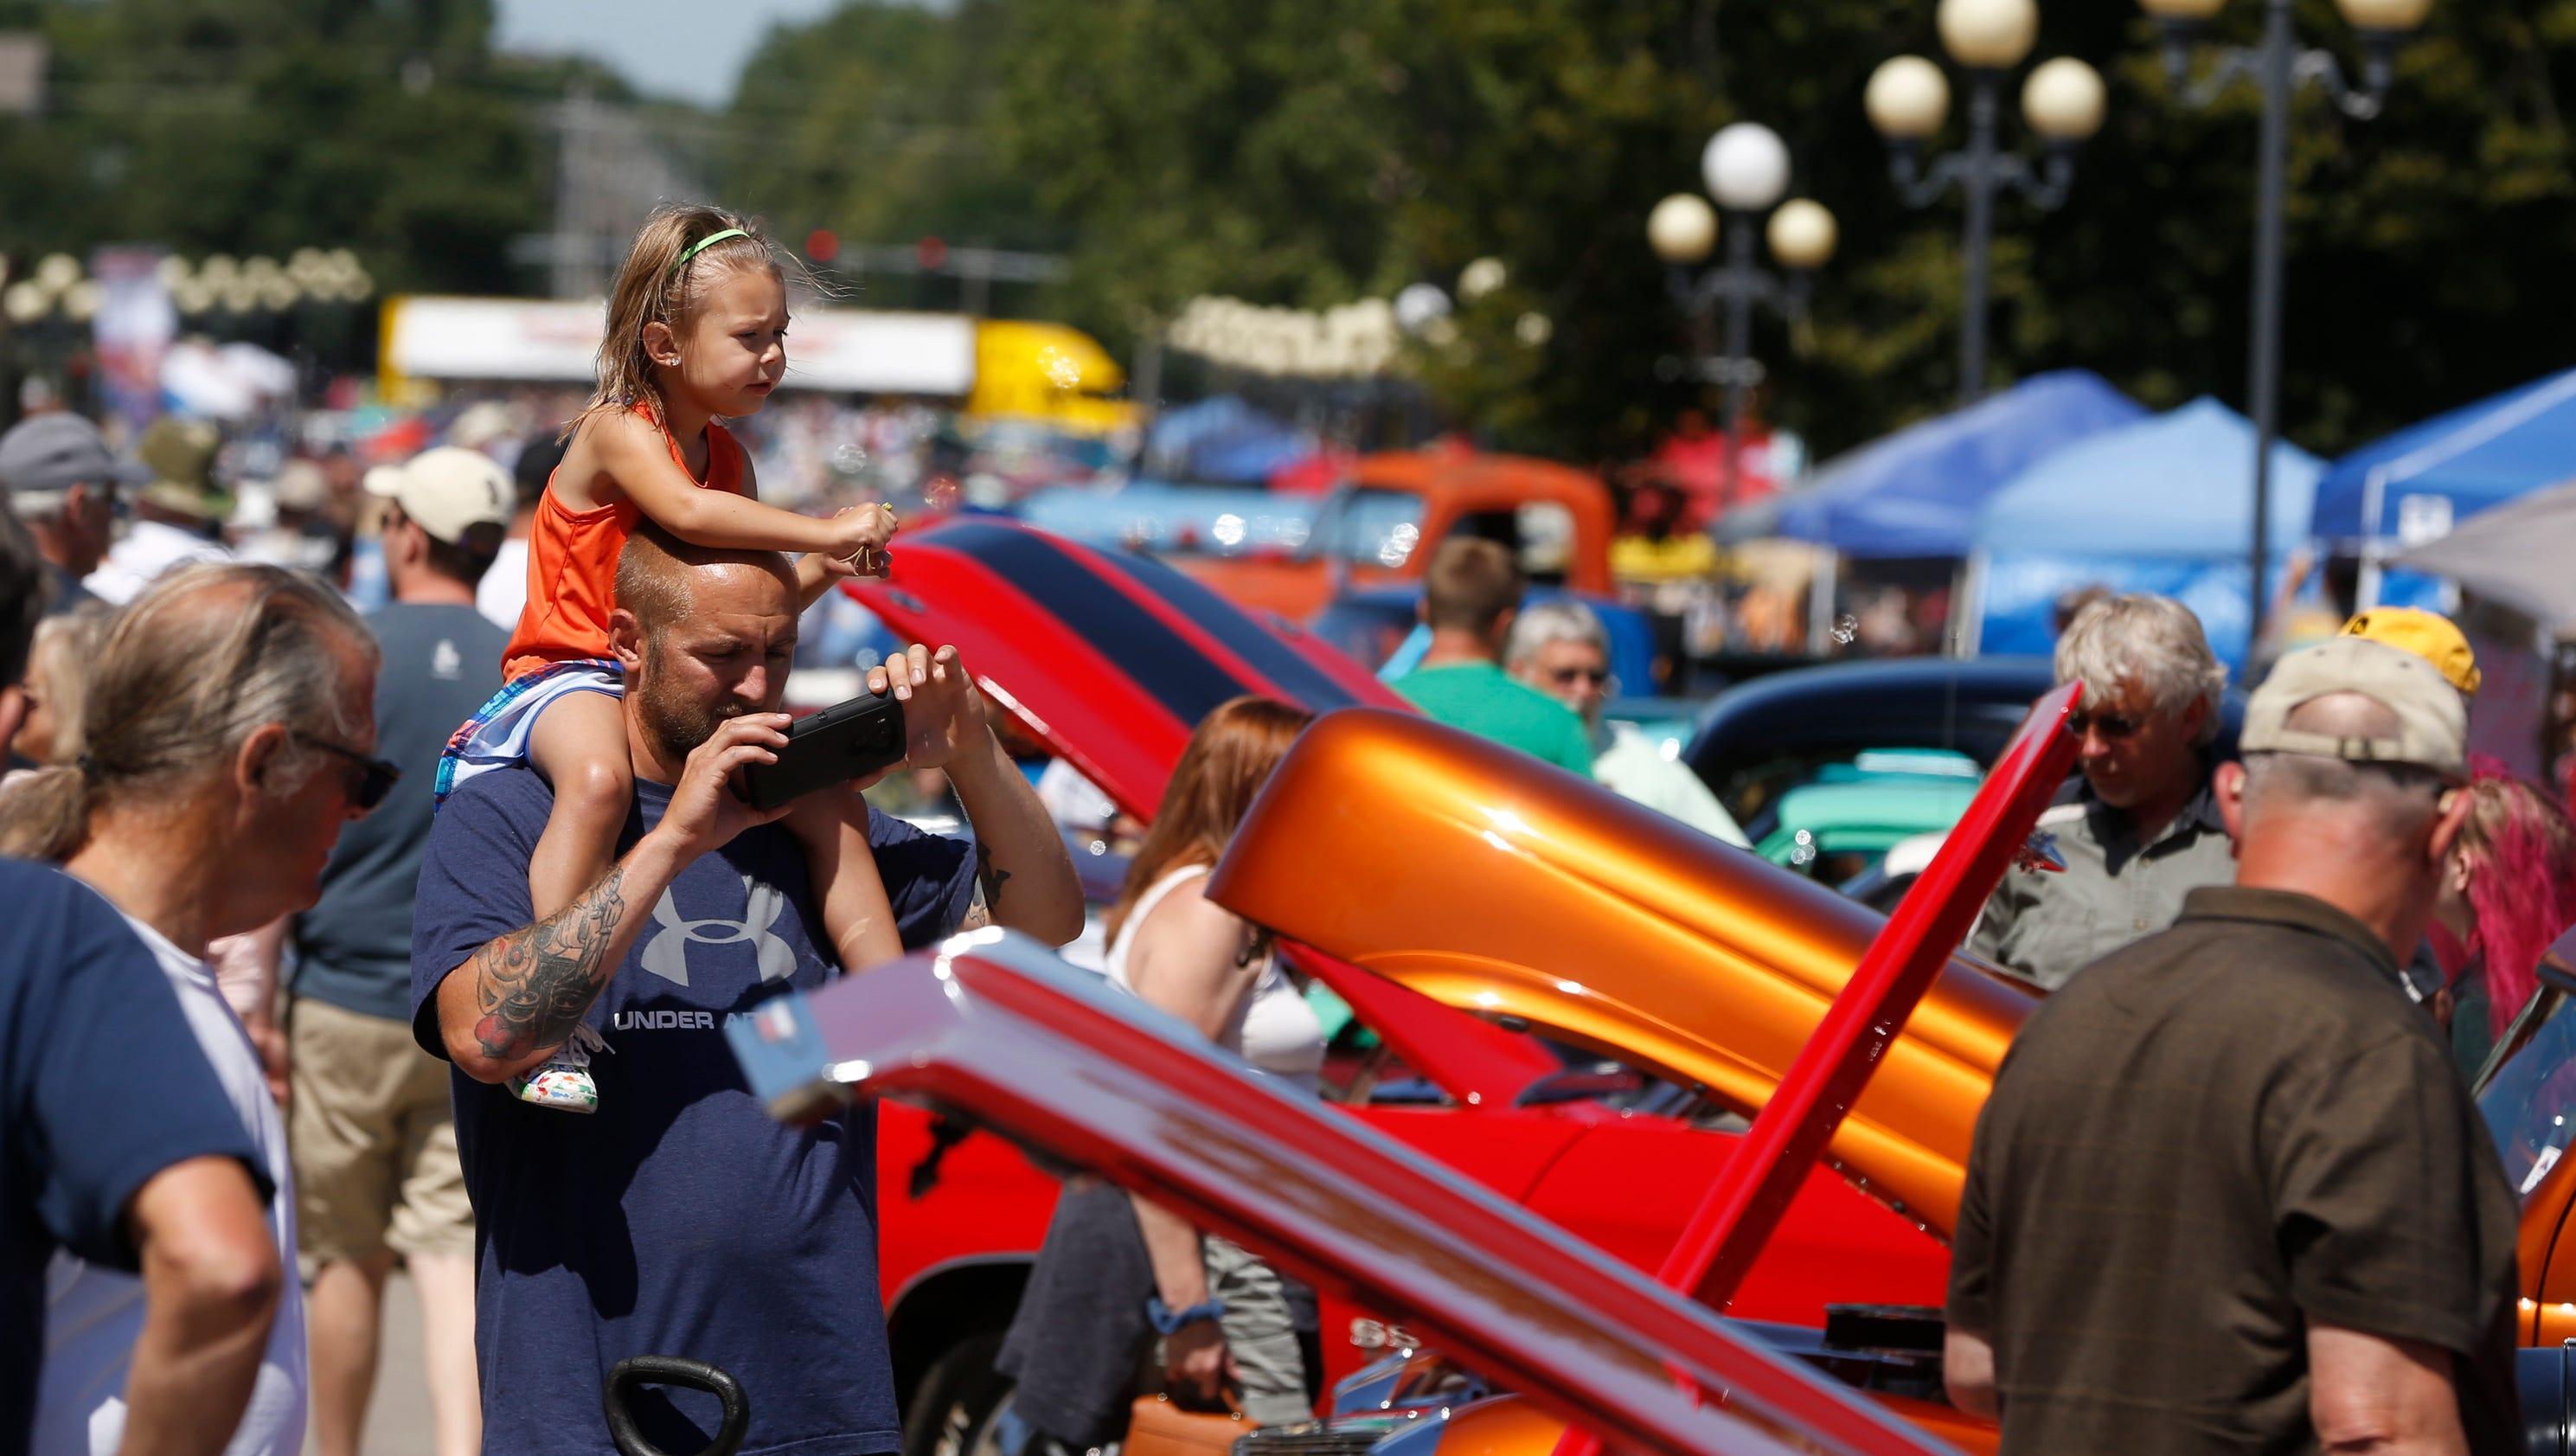 Goodguys Car Show  Des Moines